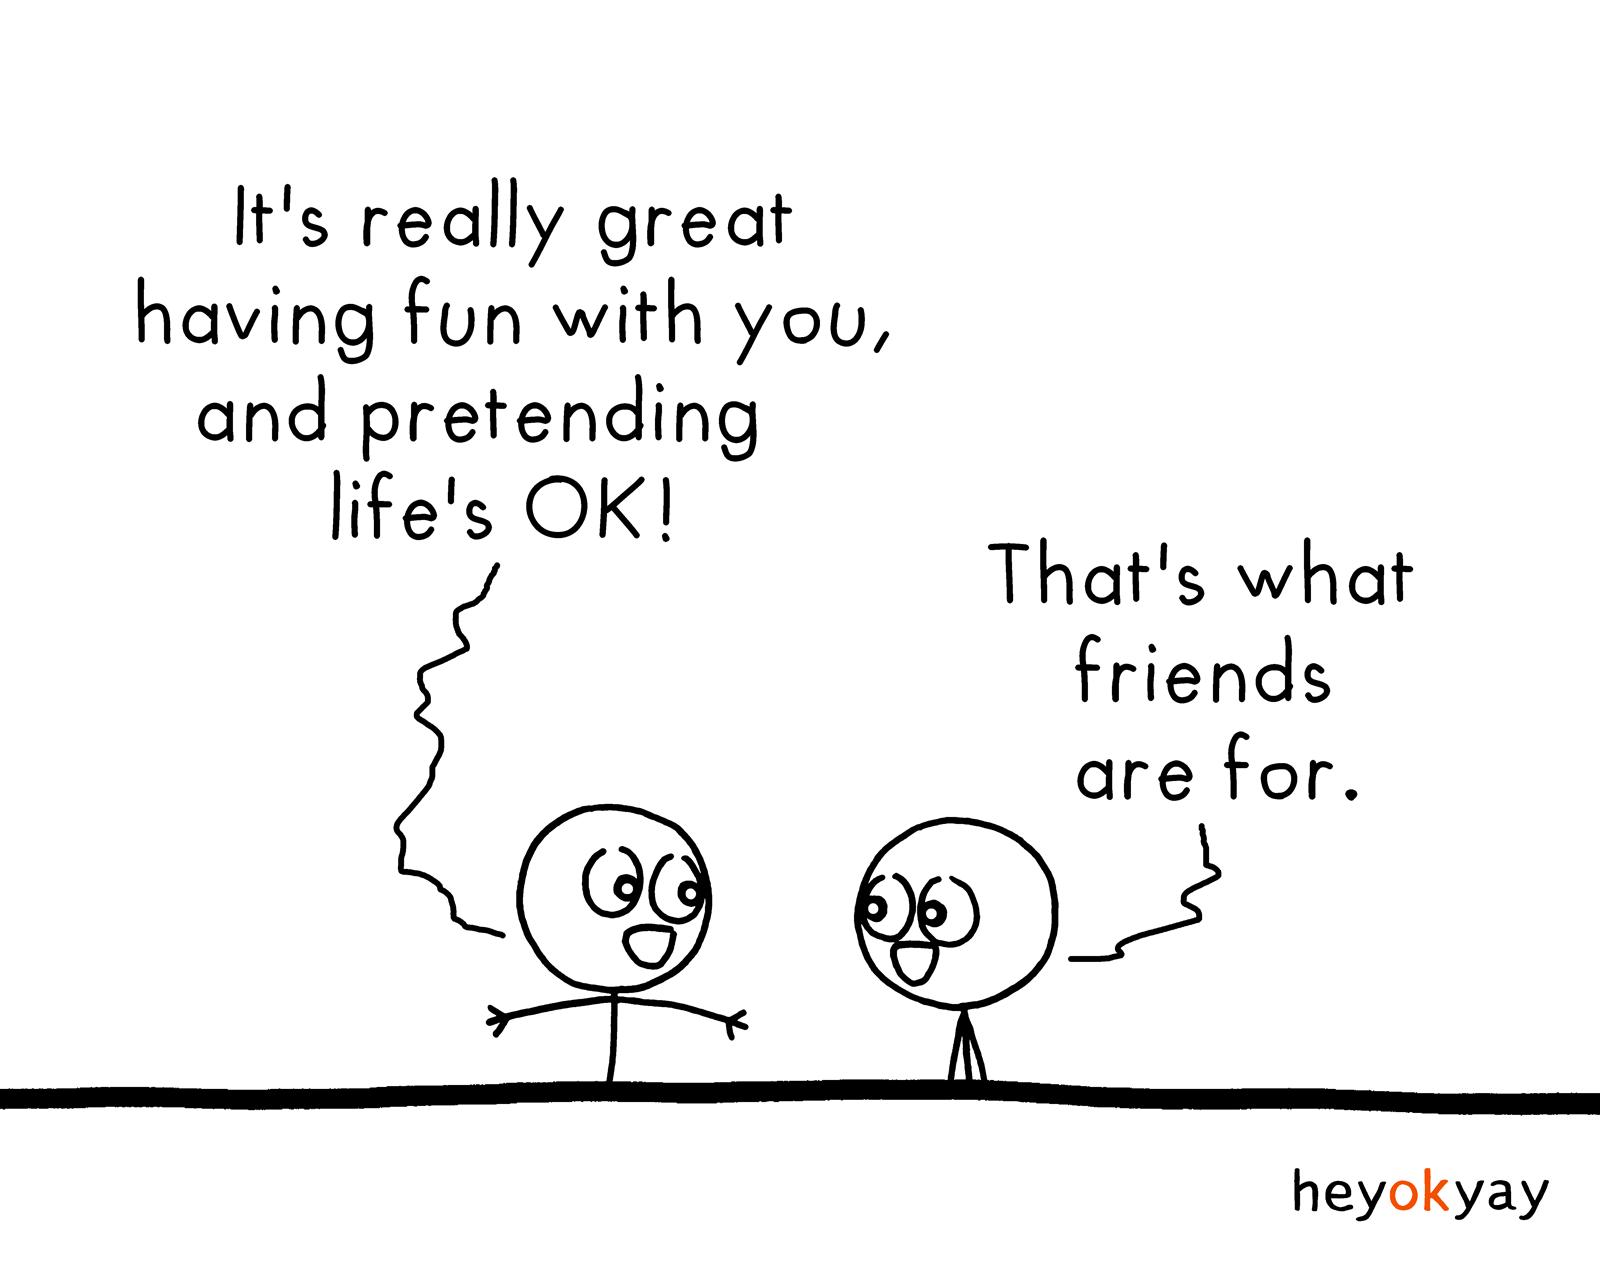 Pretending heyokyay comic